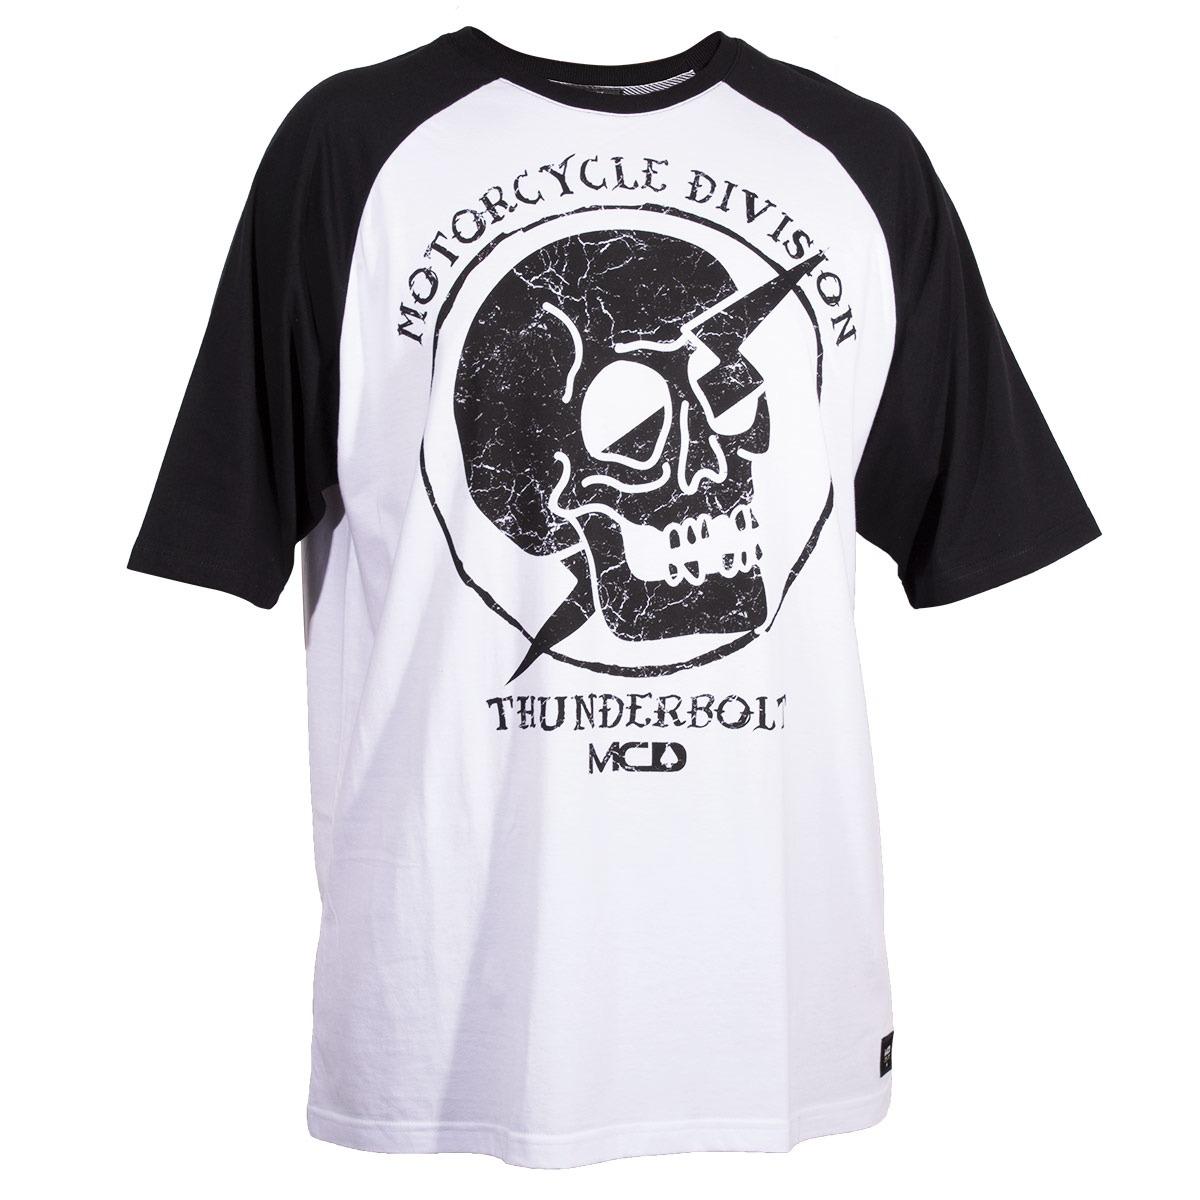 Camiseta Mcd Raglan Motorcycle - Branco preto-gg - R  129 10820dbdb63